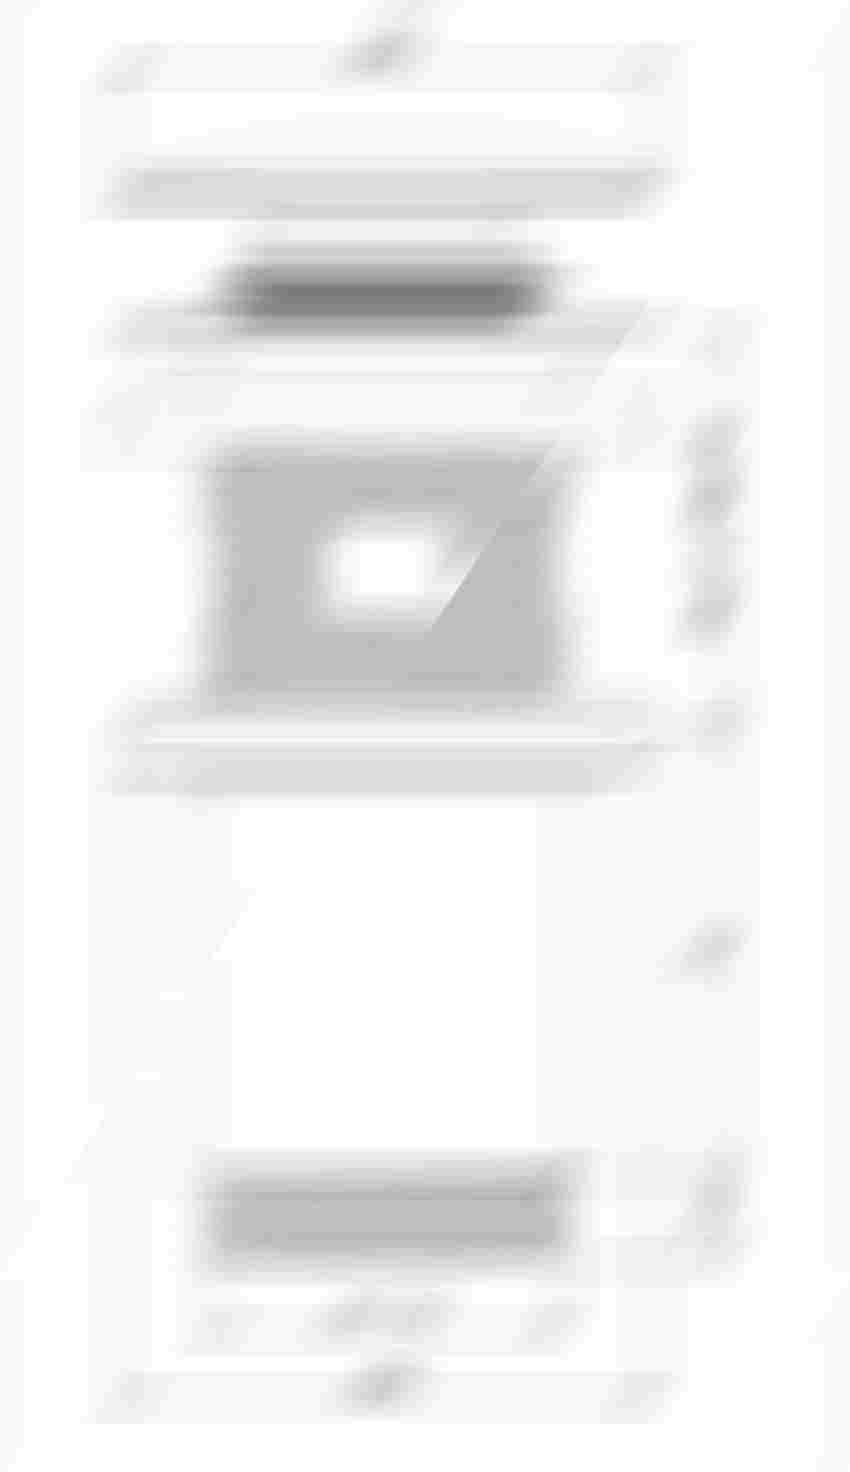 Korek umywalkowo-bidetowy Excellent Korek Uniwersalny rysunek techniczny